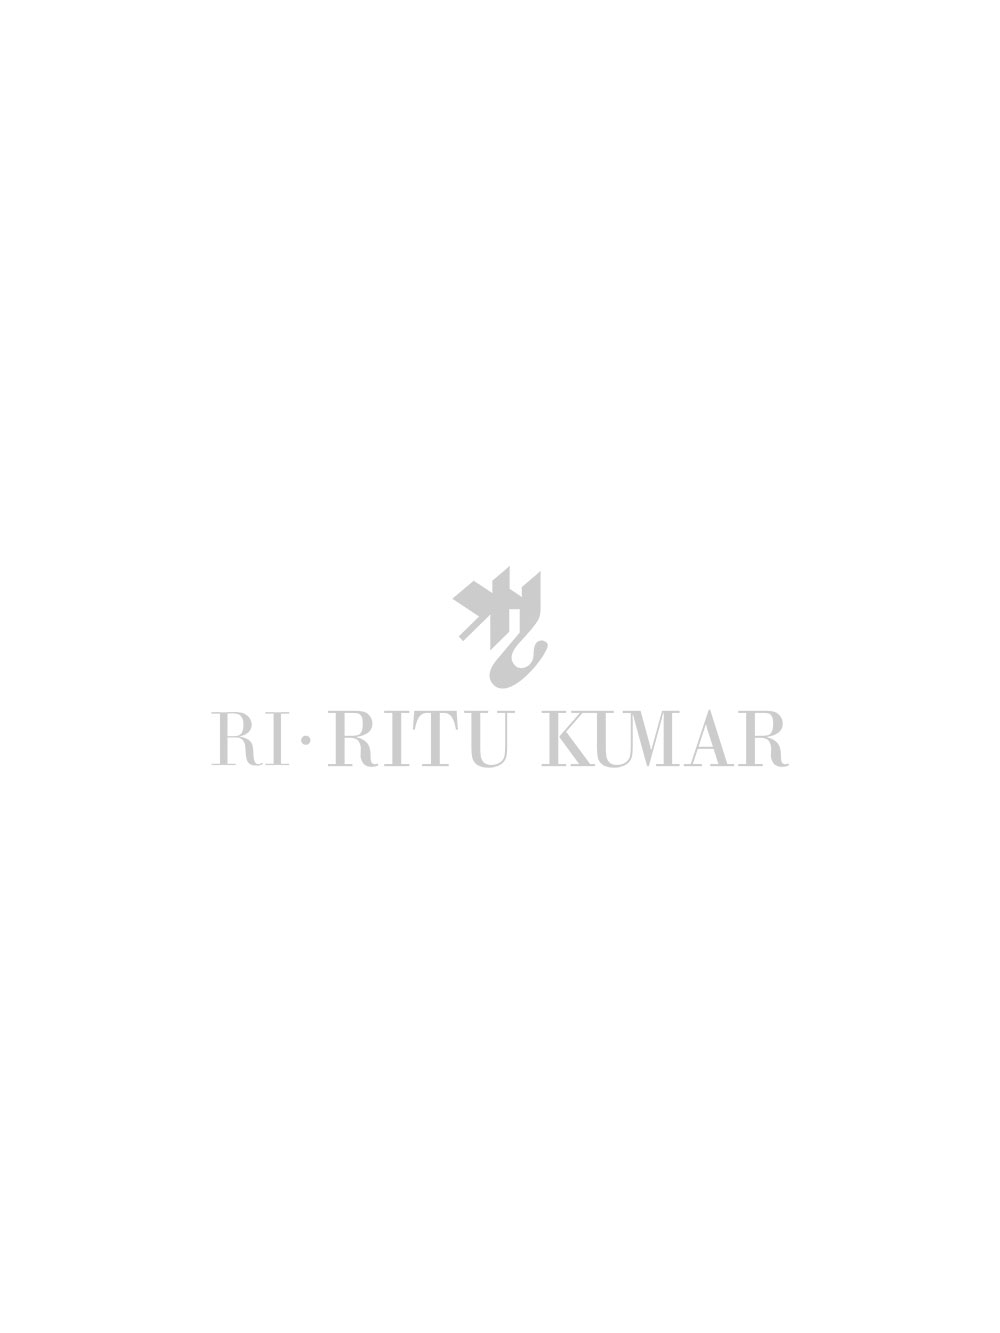 White & Khaki Embroidered Double Layered Kurta With Dupatta And Palazzo